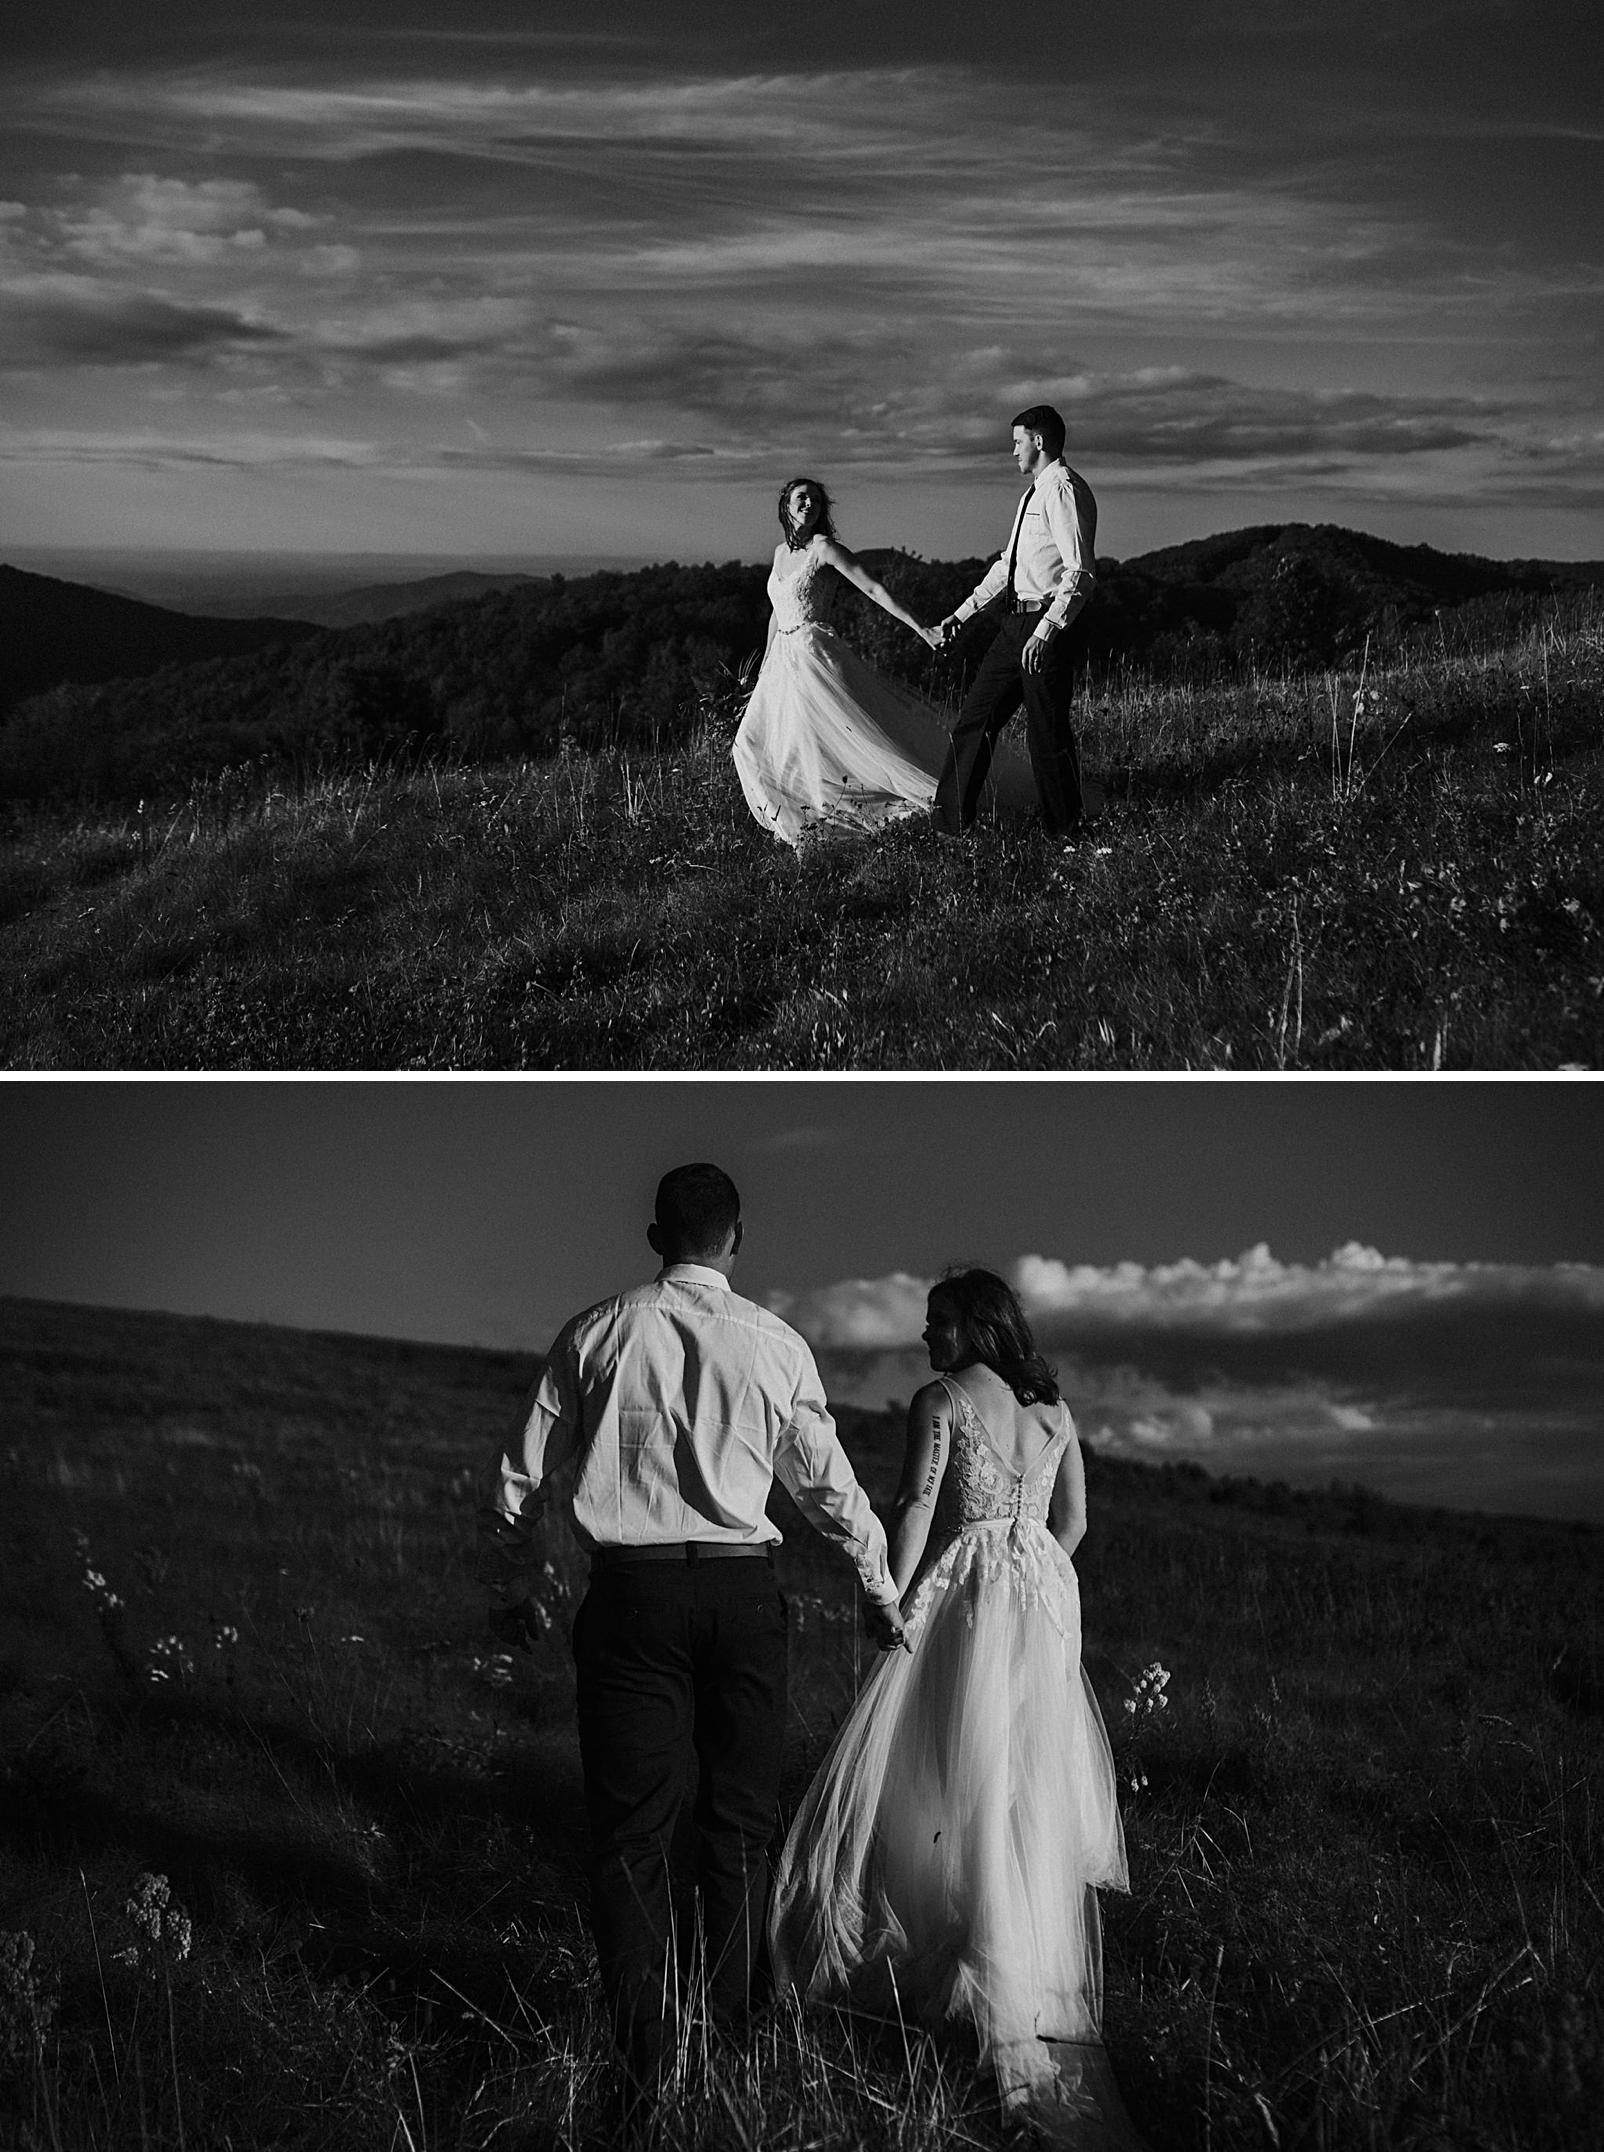 twyla jones photography | www.twylajones.com |  wedding vow renewal asheville north carolina max patch-2.jpg